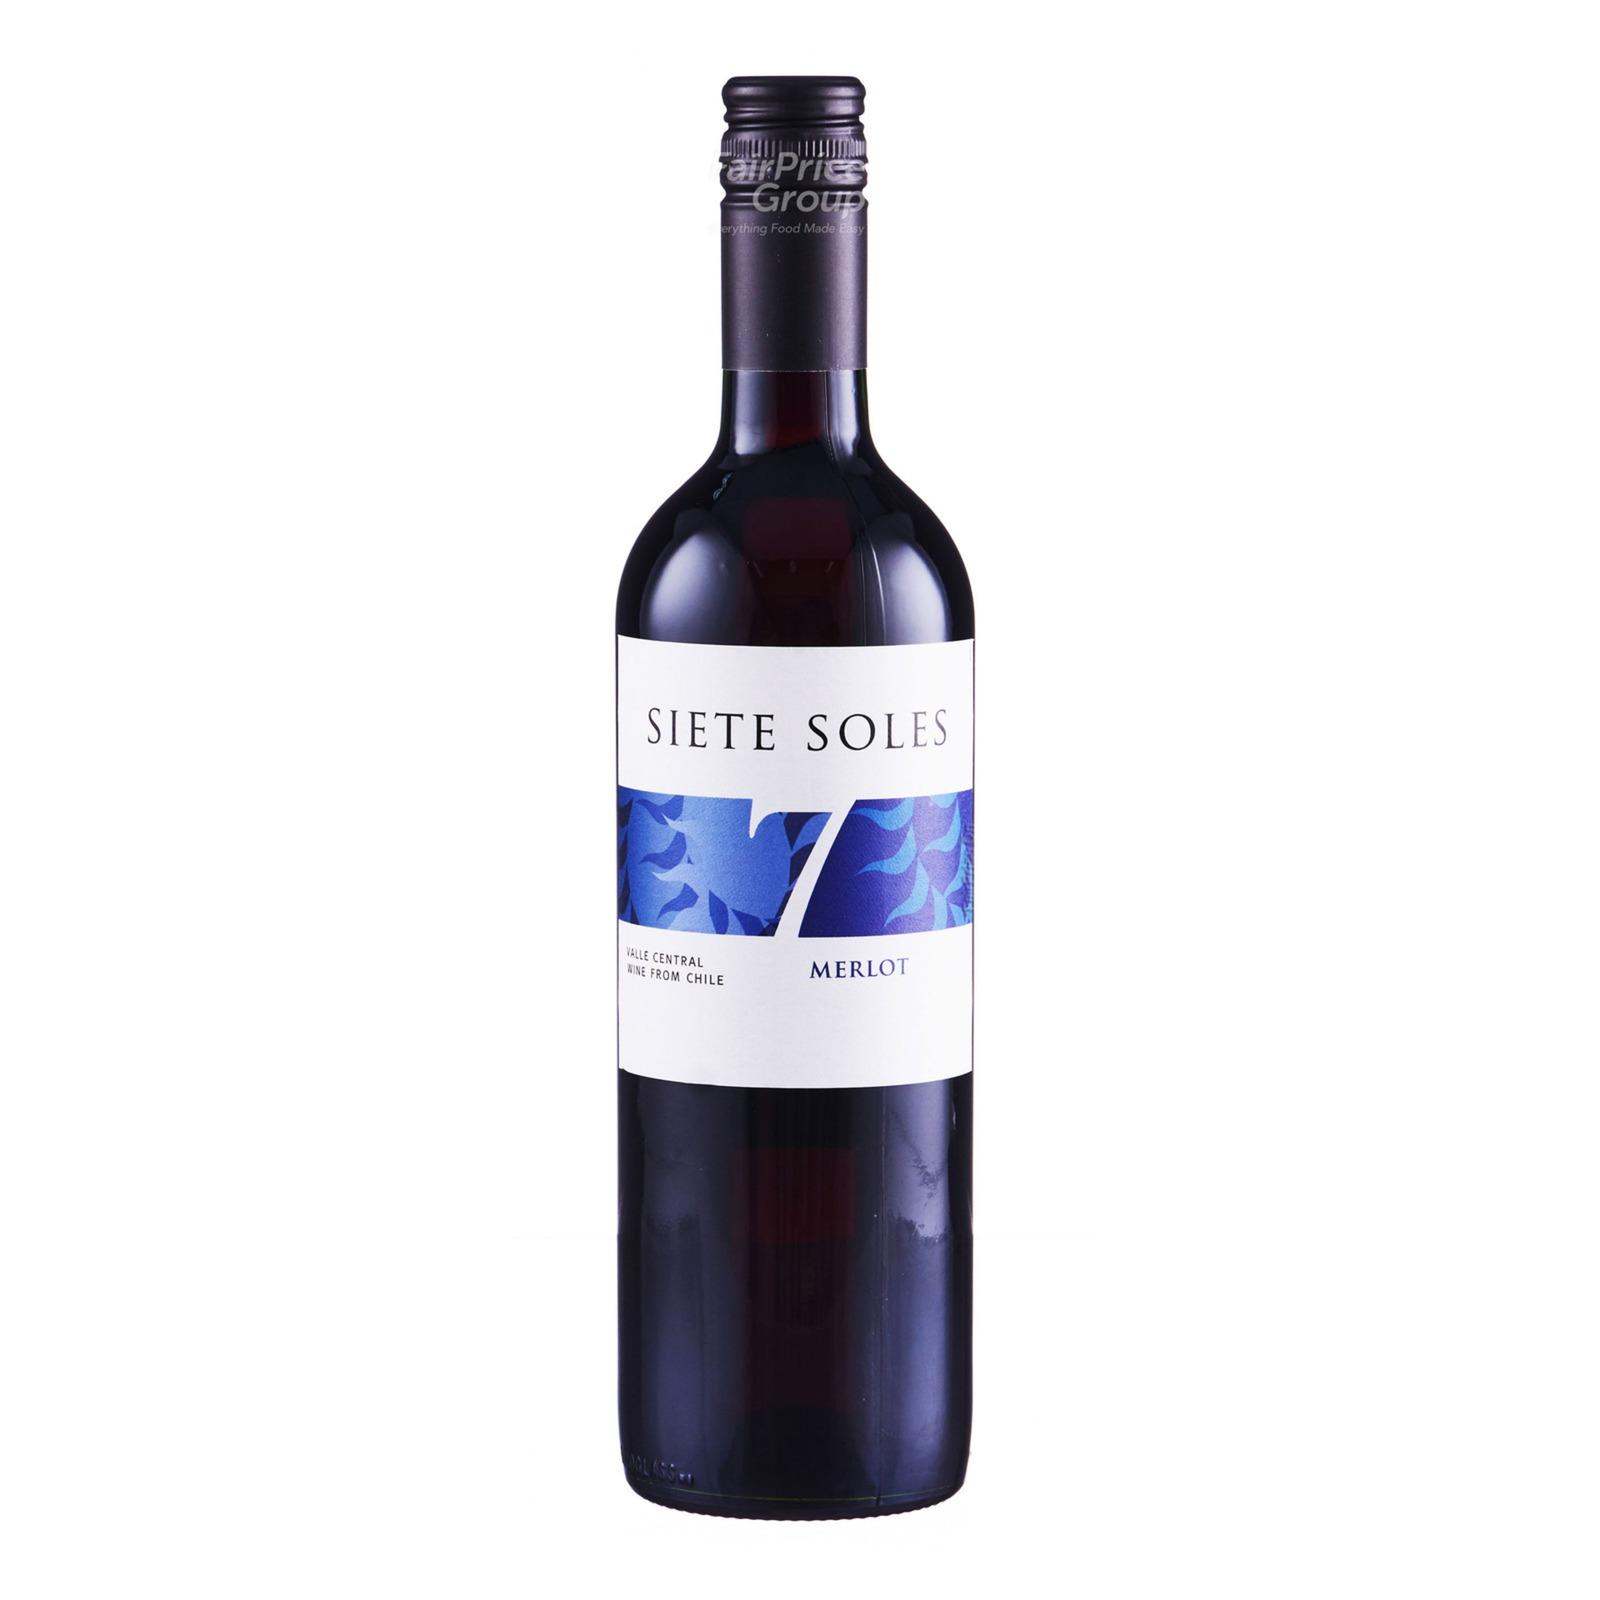 Siete Sole Red Wine - Merlot